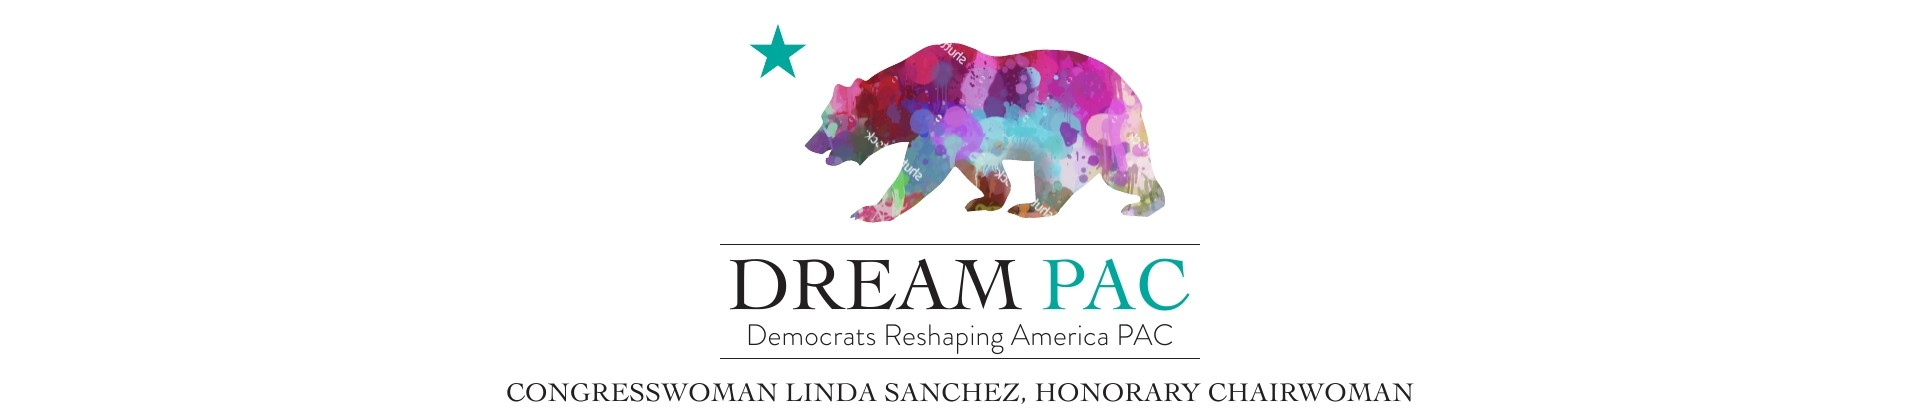 Democrats Reshaping America (DREAMPAC)